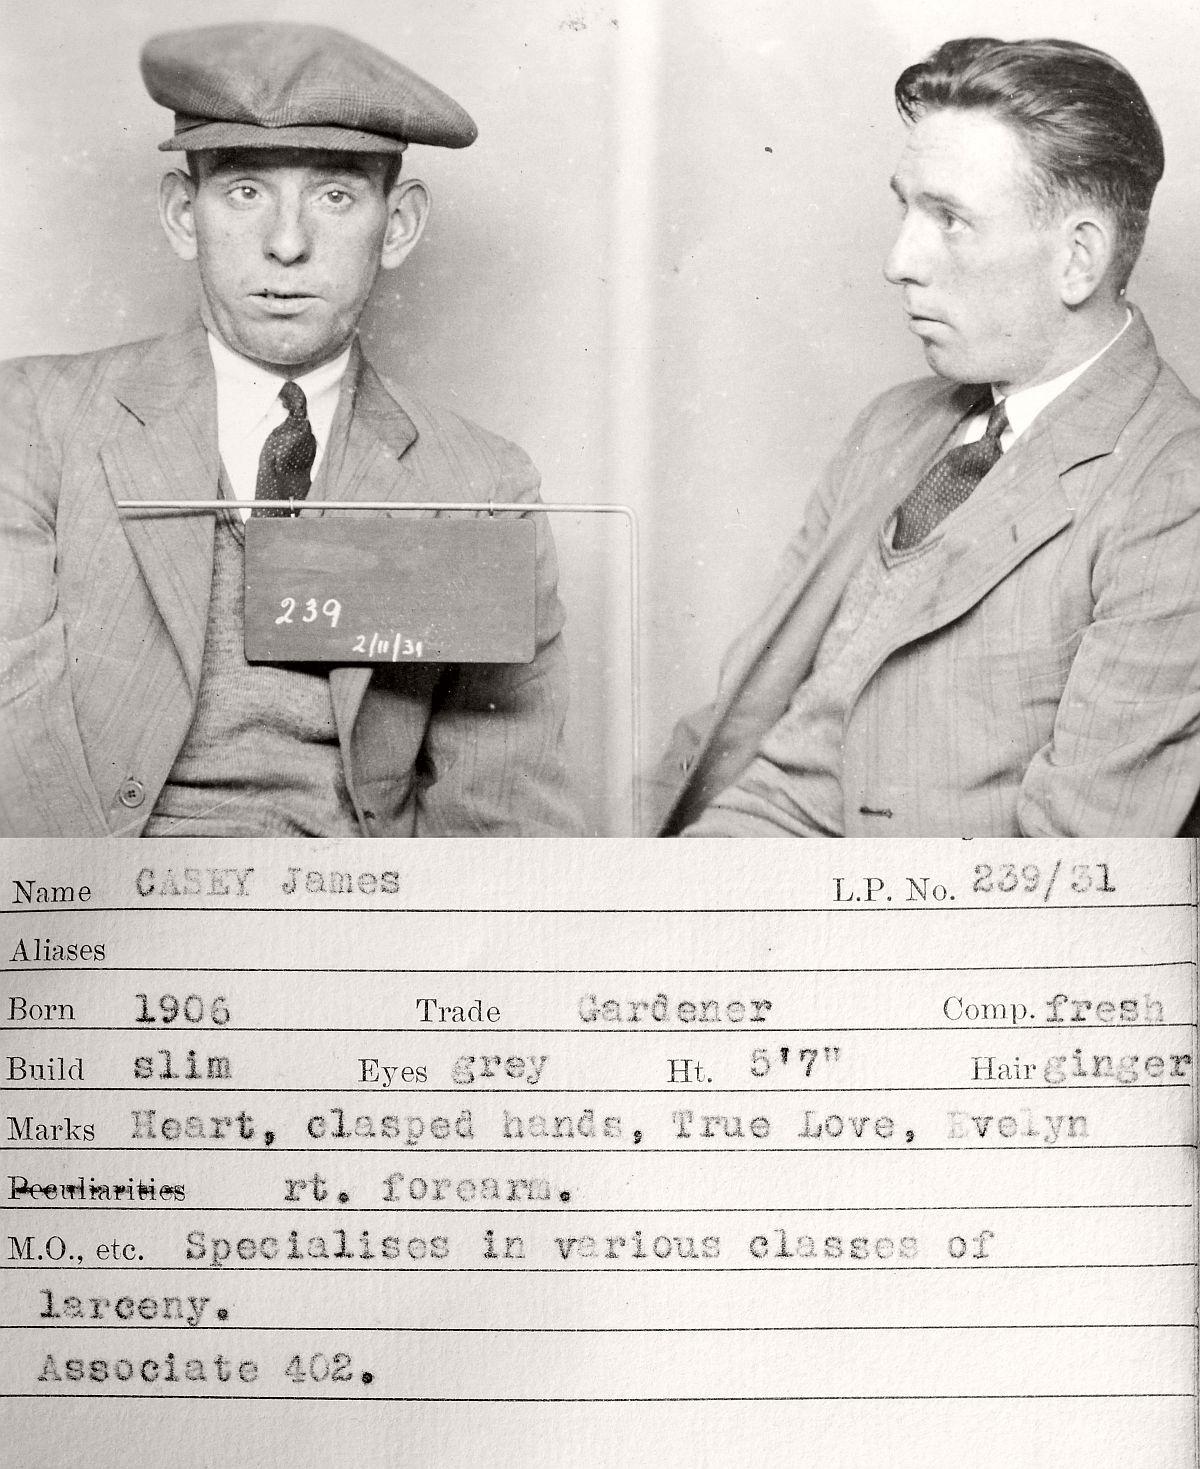 vintage-mug-shot-of-criminals-from-newcastle-upon-tyne-1930s-07